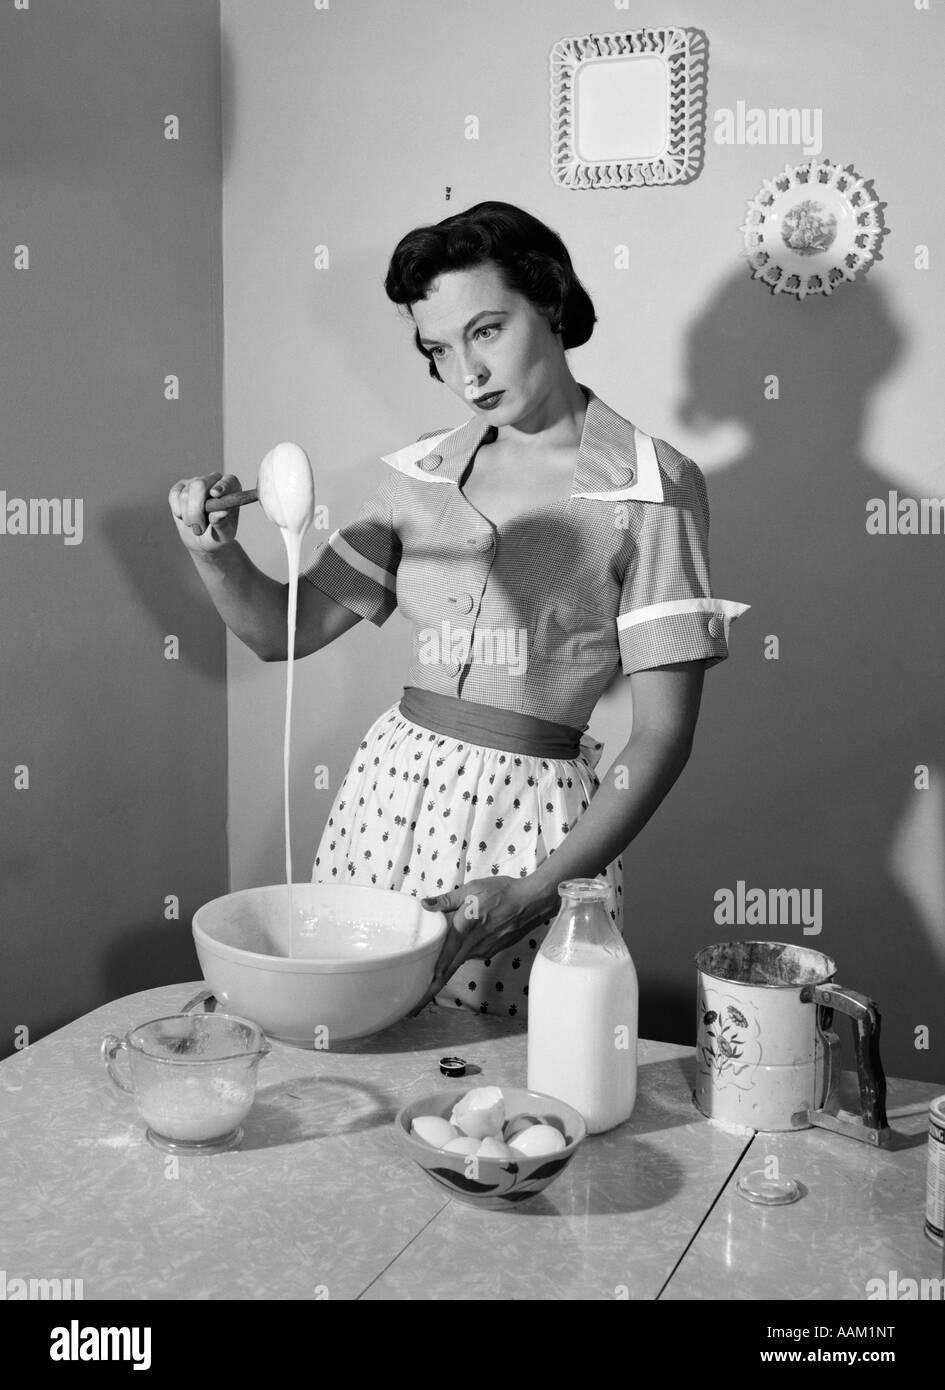 1960 ama de casa la mezcla pegajosa bateador en la cocina Imagen De Stock